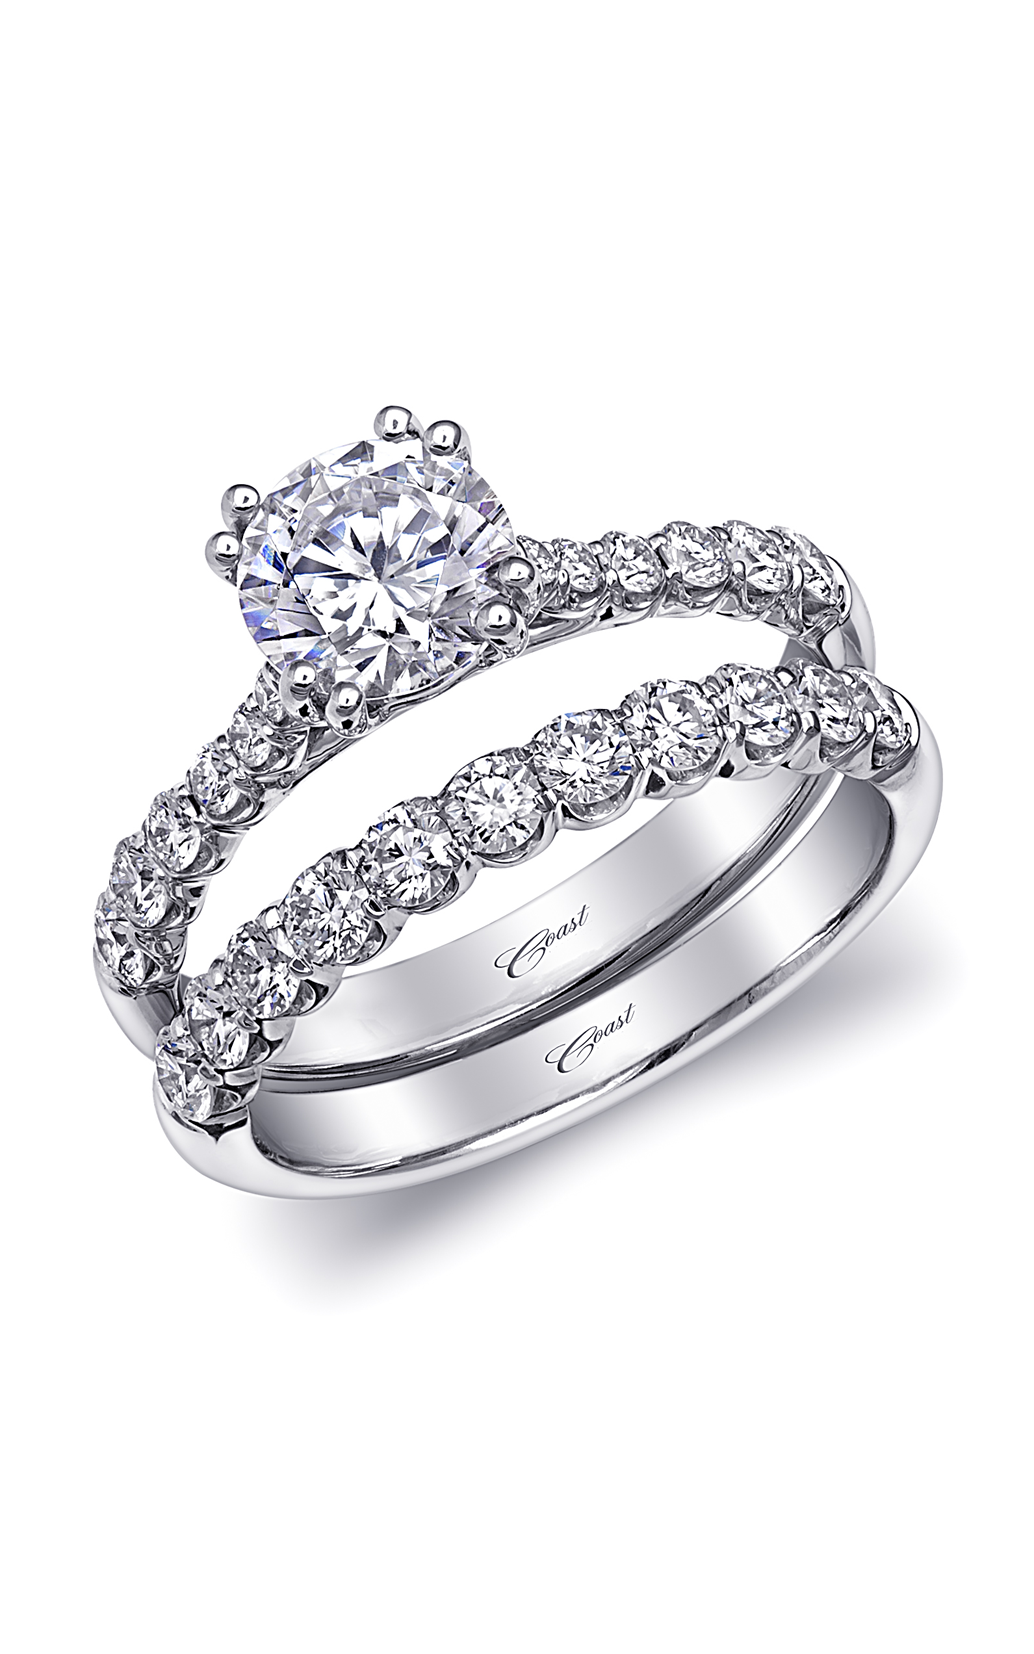 Coast Diamond Charisma LS15001 WS15001 product image